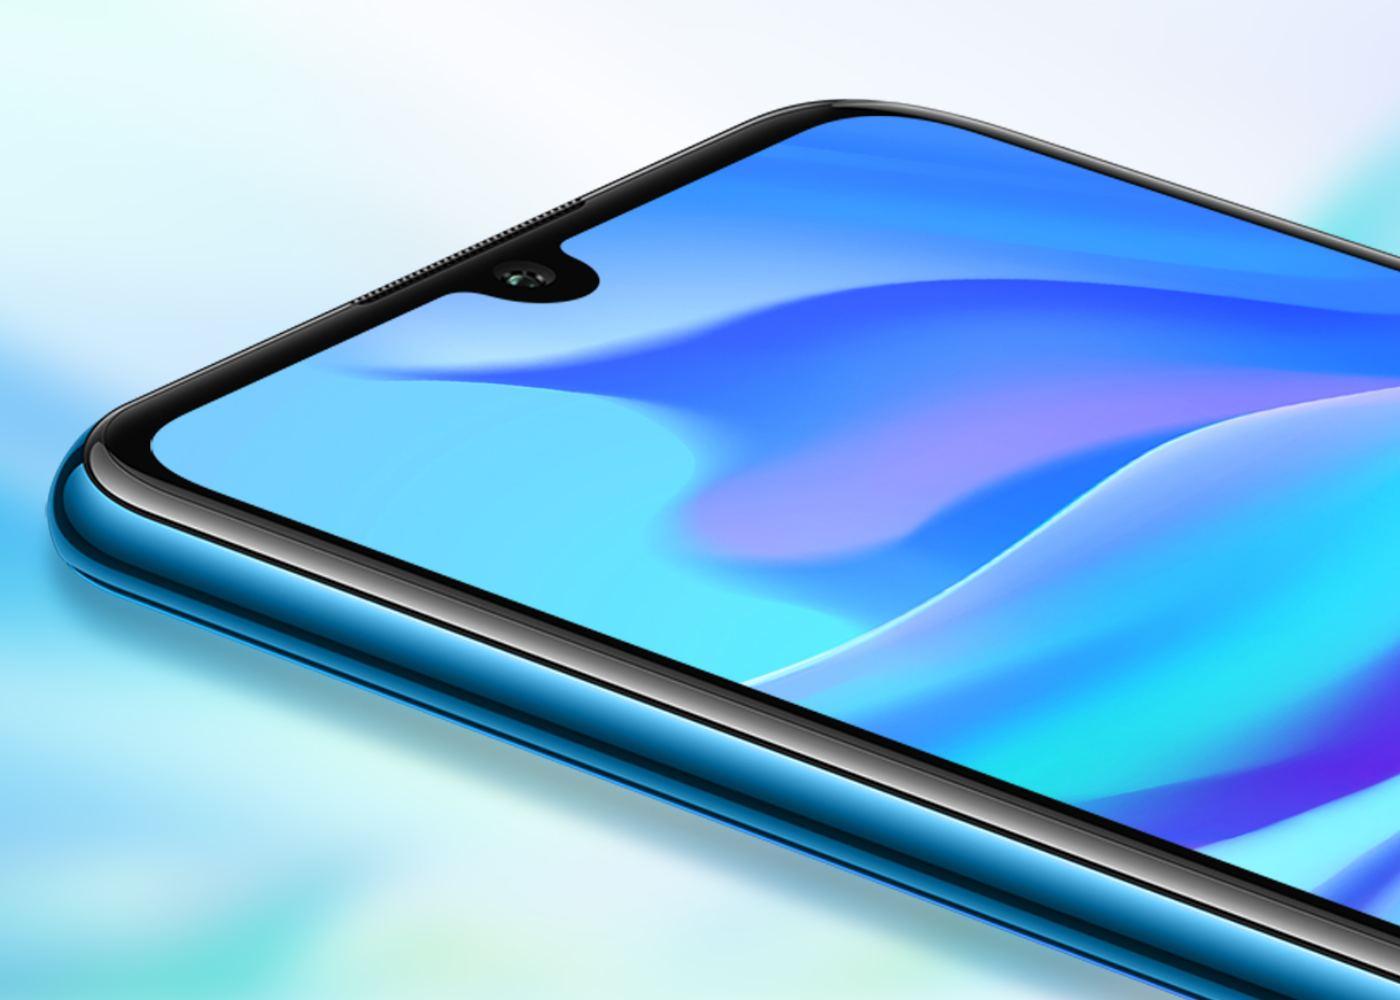 Huawei P30 Lite entra no mercado